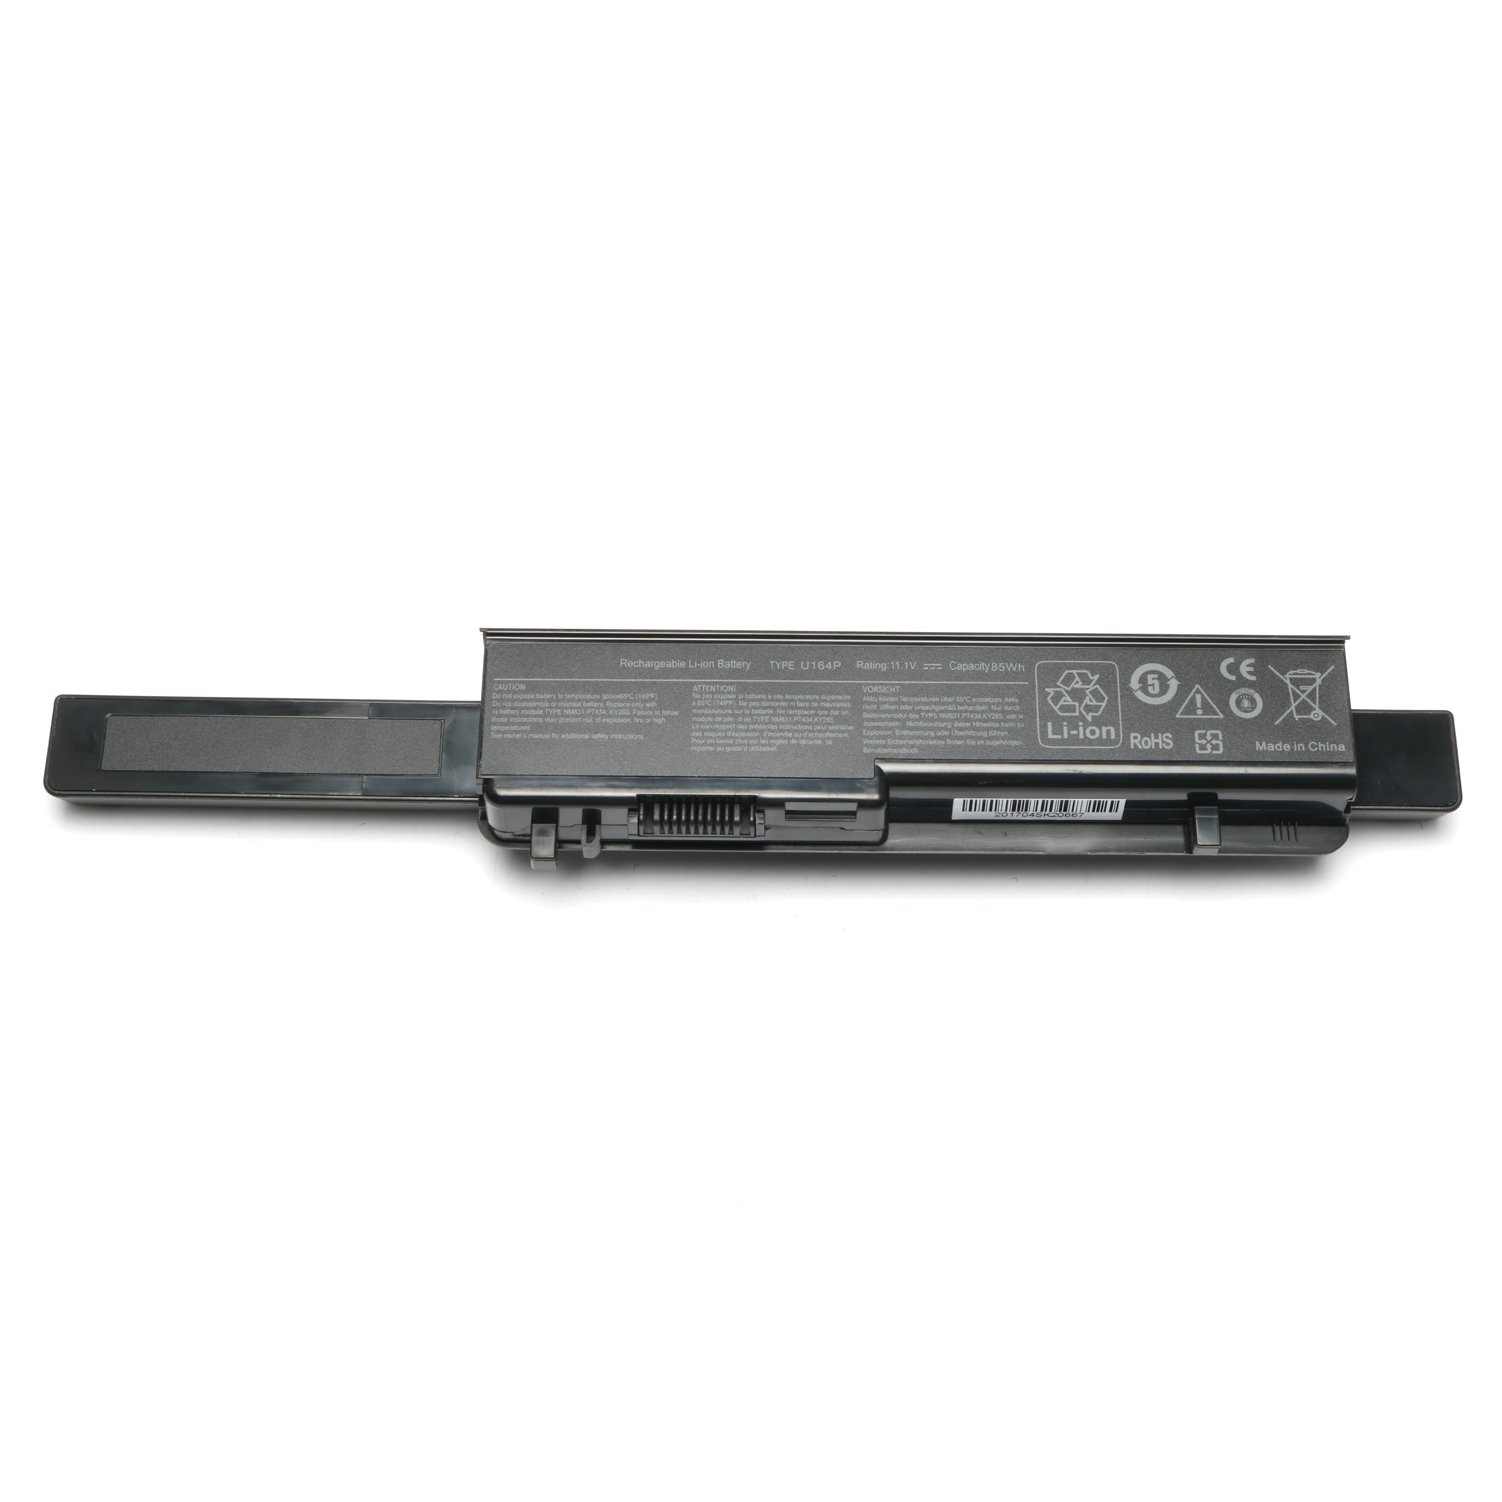 New Laptop Battery for Dell Studio 17 1745 1747 1749 Series; P/N: N856P U164P M905P U150P 312-0196 9cell 11.1V 7800Mah/85Wh